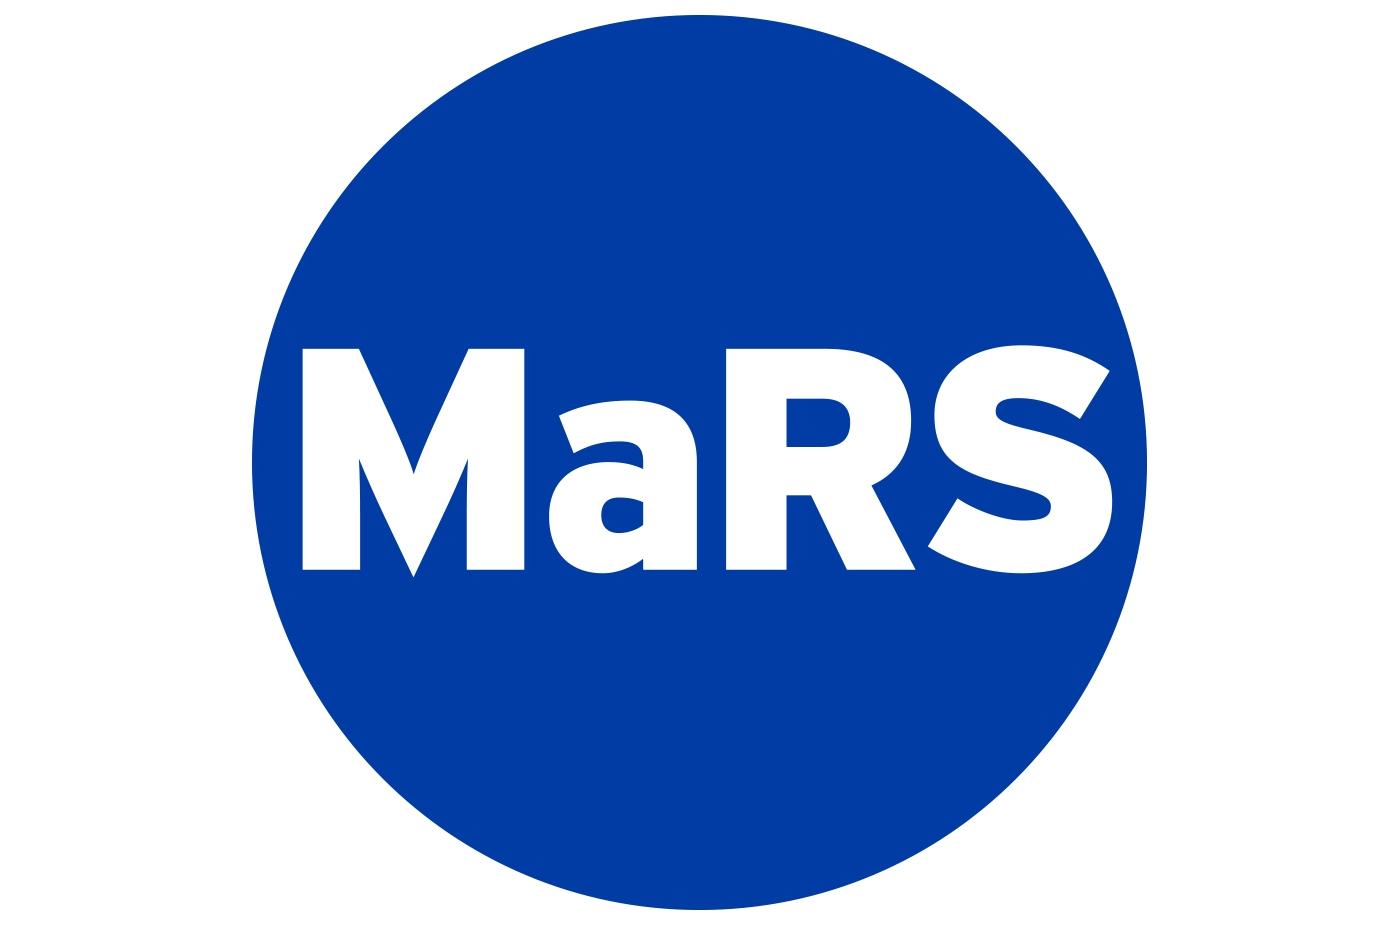 MaRS_logo_RGB-0-61-165_Online.jpg